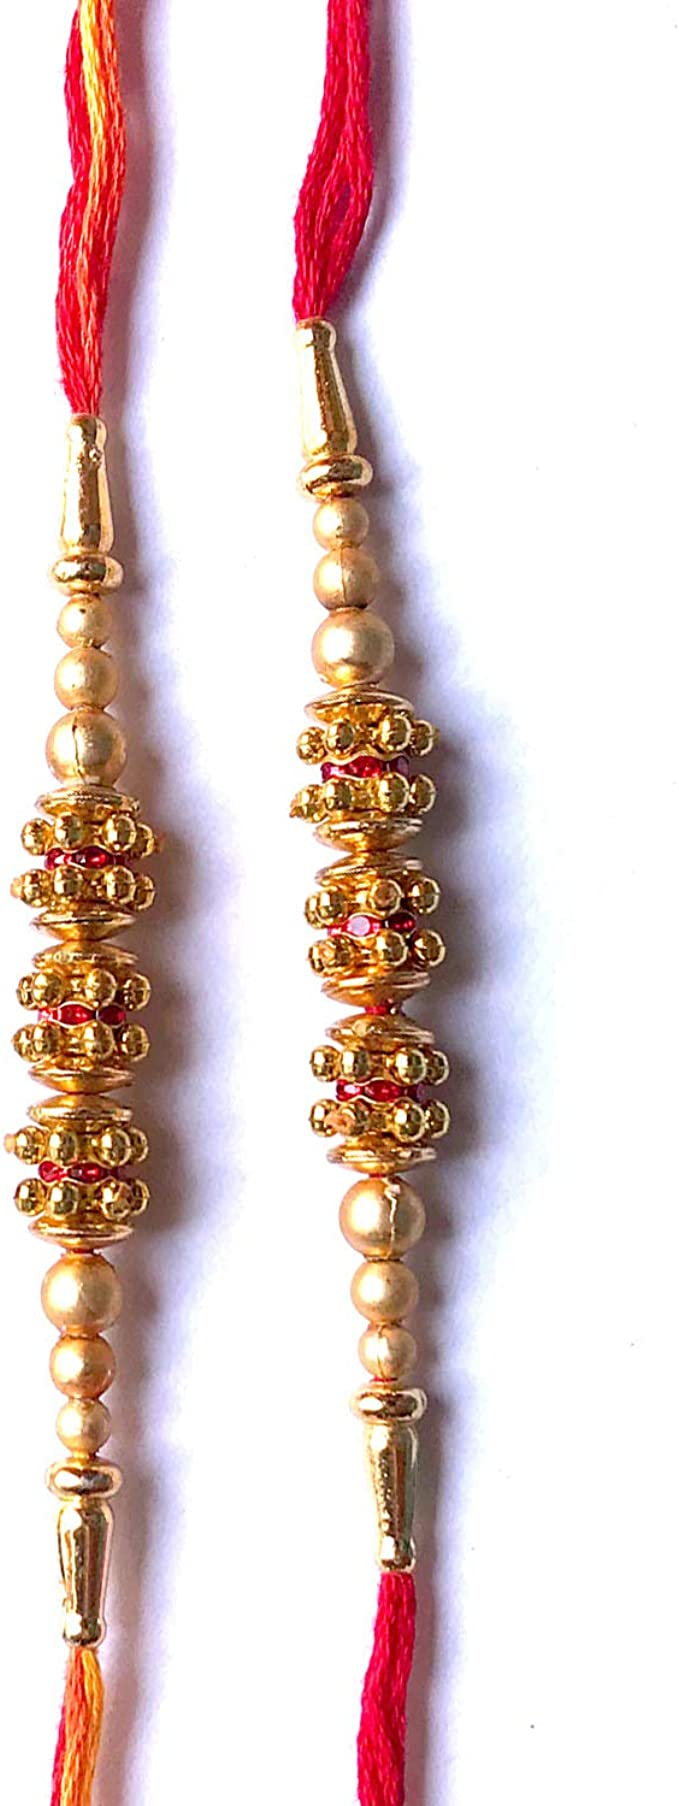 Set of Two Rakhi Bracelets in Individual Designs Handmade Free Size Rakhi//Rakhri//Friendship Bracelet Thread with Beautiful Multi-Coloured Beads in Traditional Indian Colours Design 6621